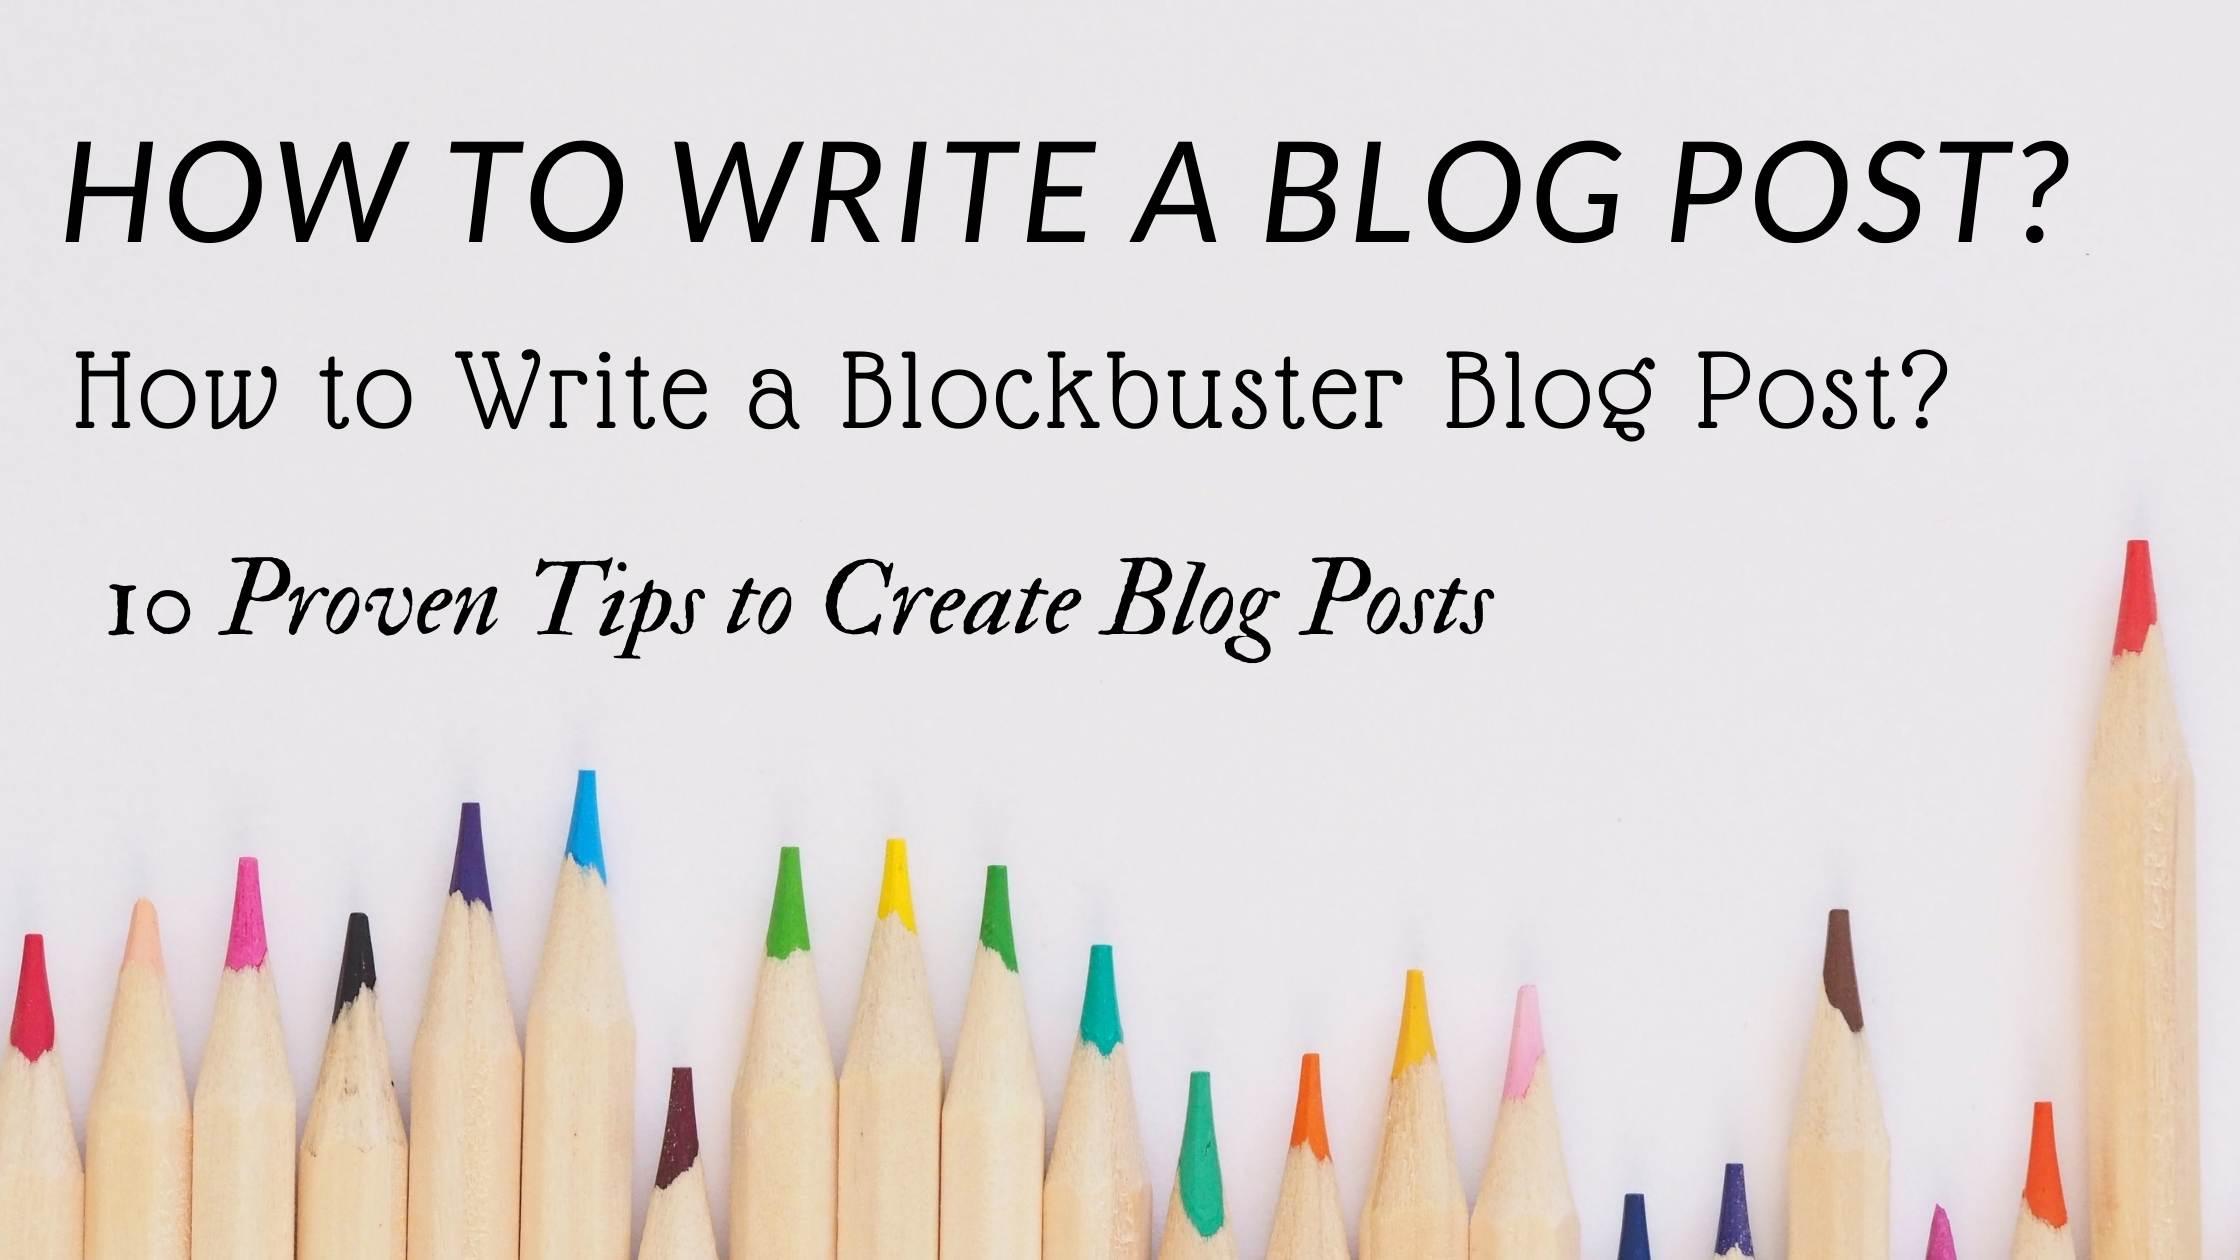 Write a Blockbuster Blog Post,